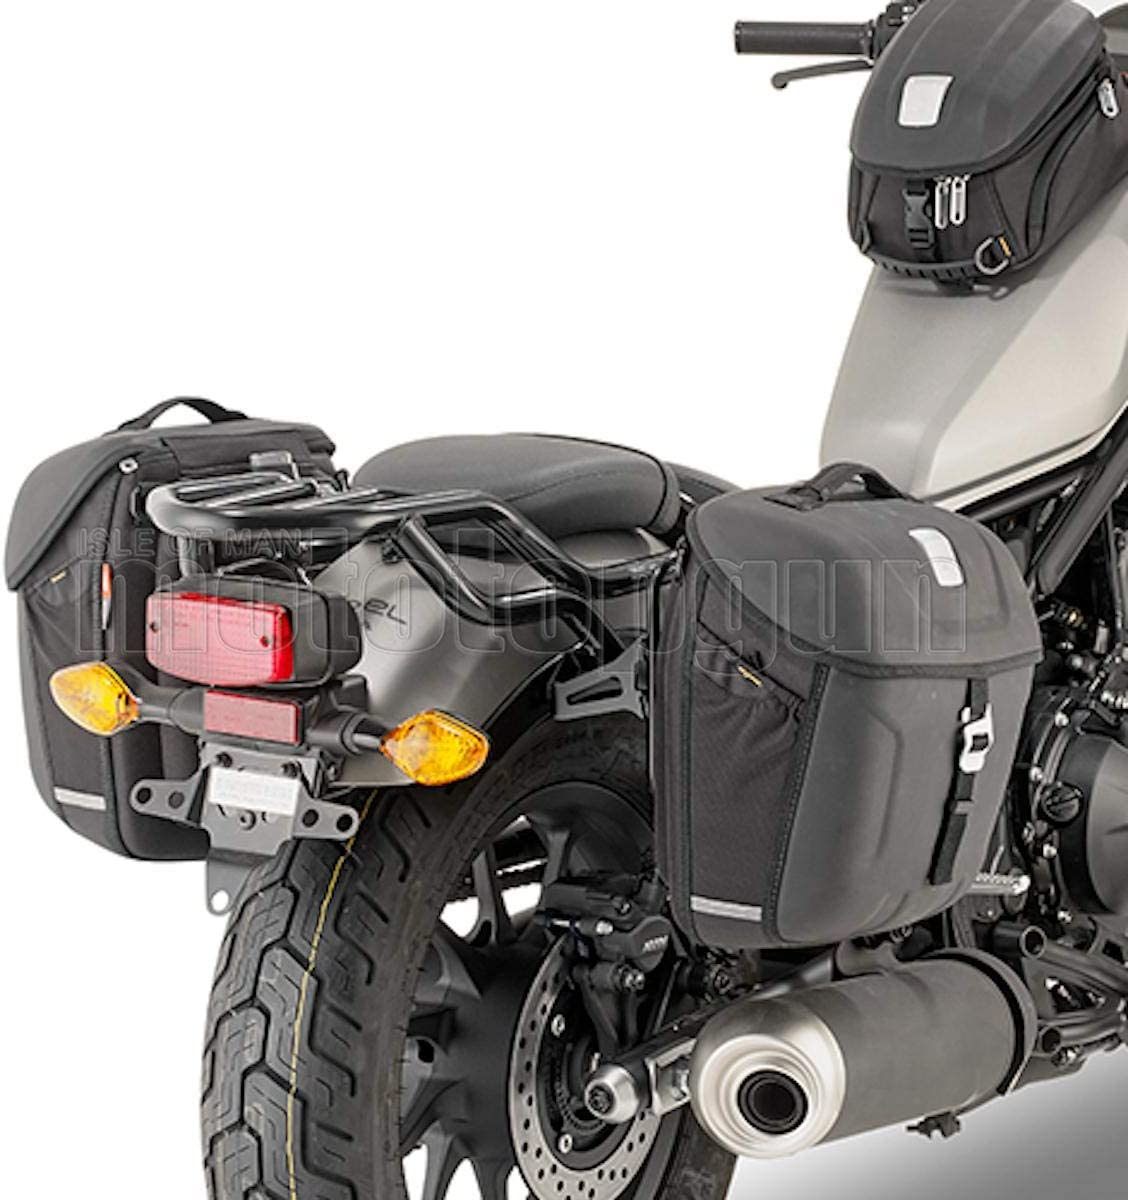 Givi Abstandshalter Satteltaschen Mt501 Kompatibel Mit Honda Cmx 500 Rebel 2017 17 2018 18 Auto